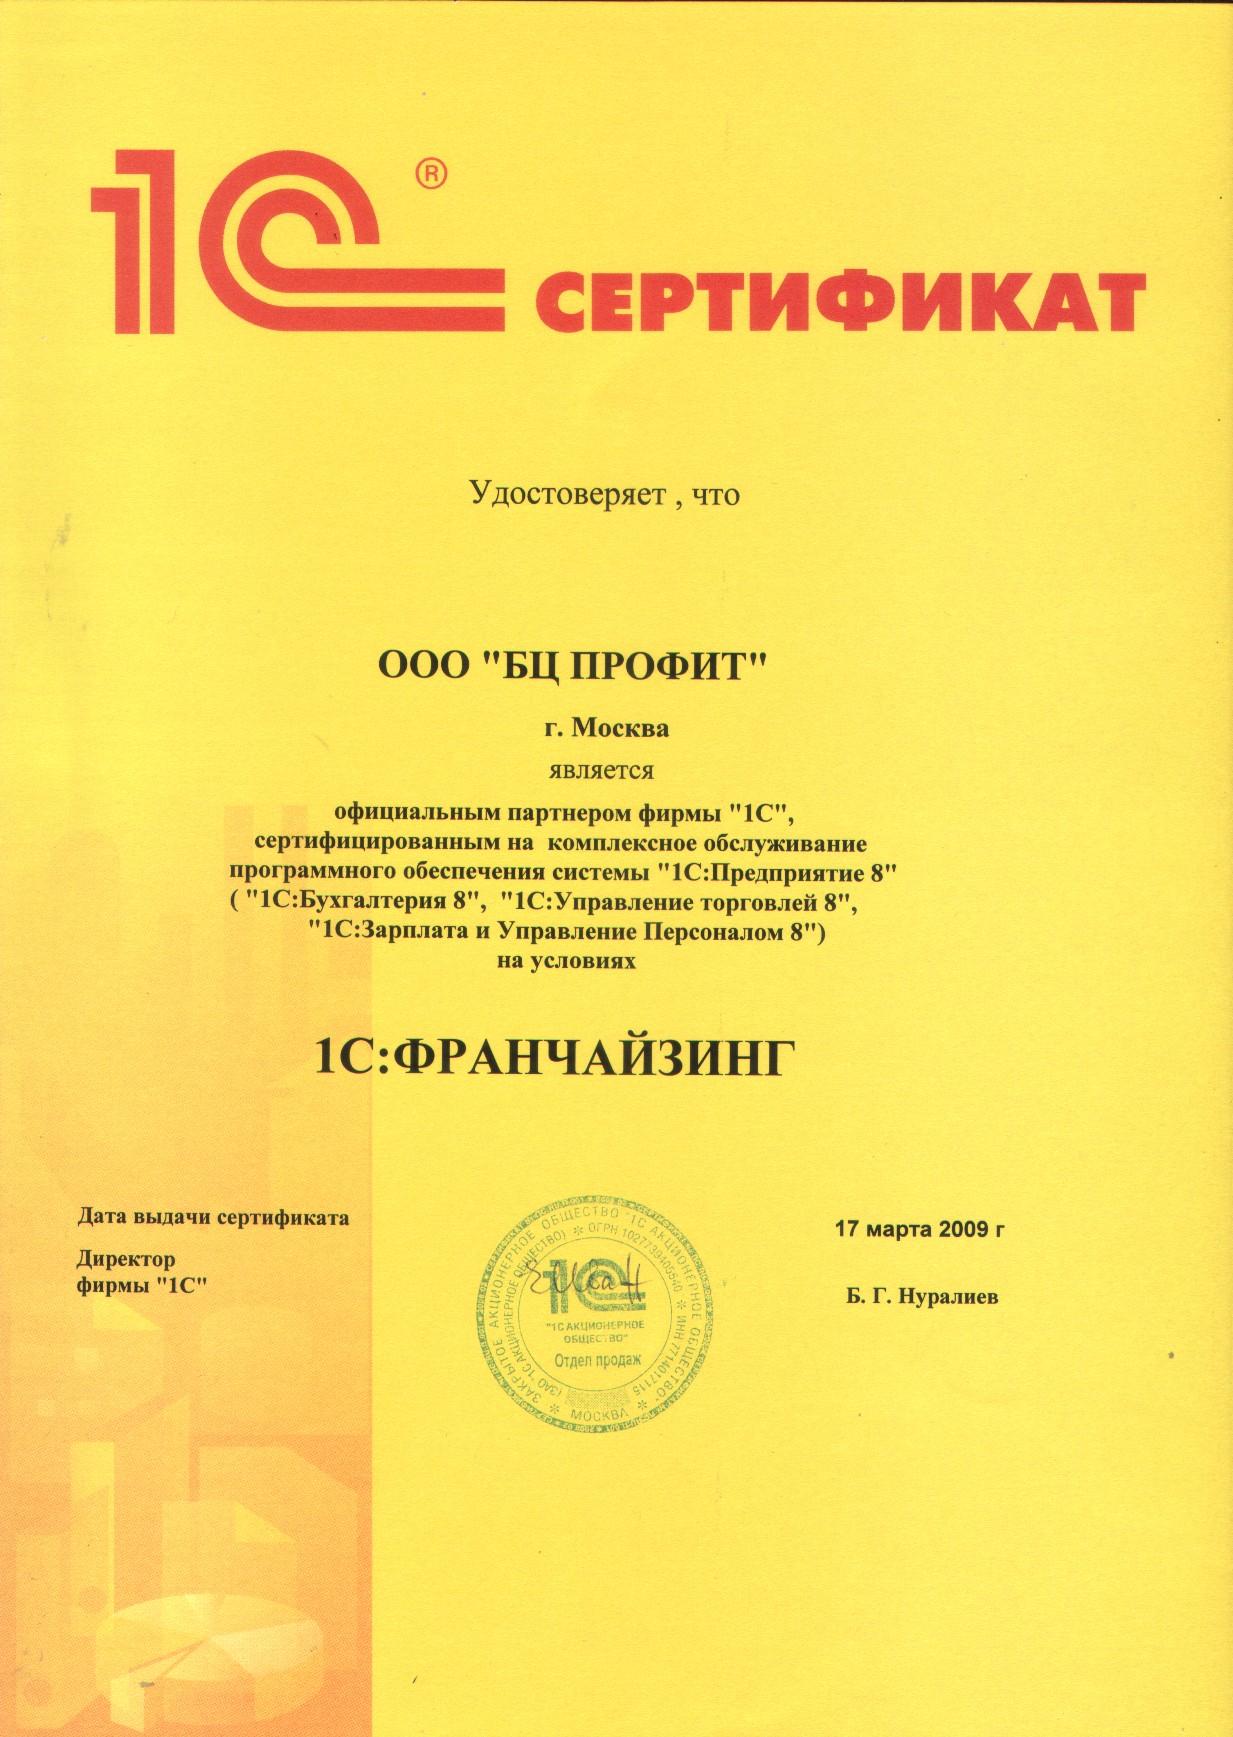 Сертификат 1С - Subscribe Ru